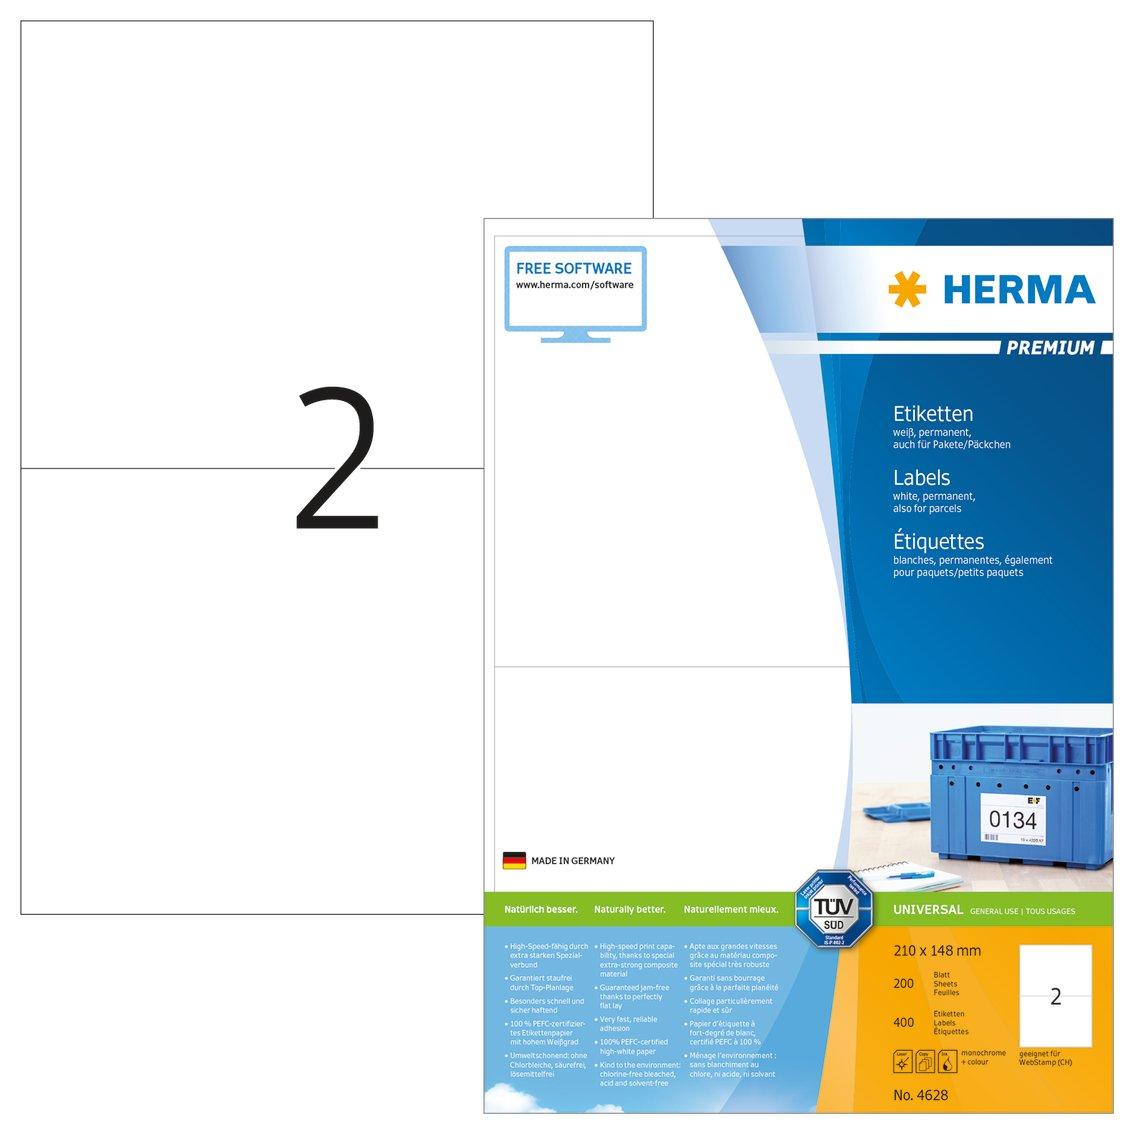 Herma Etichetta Super Adesiva 210 x 148 A4, 50 Pezzi, Bianco 10910